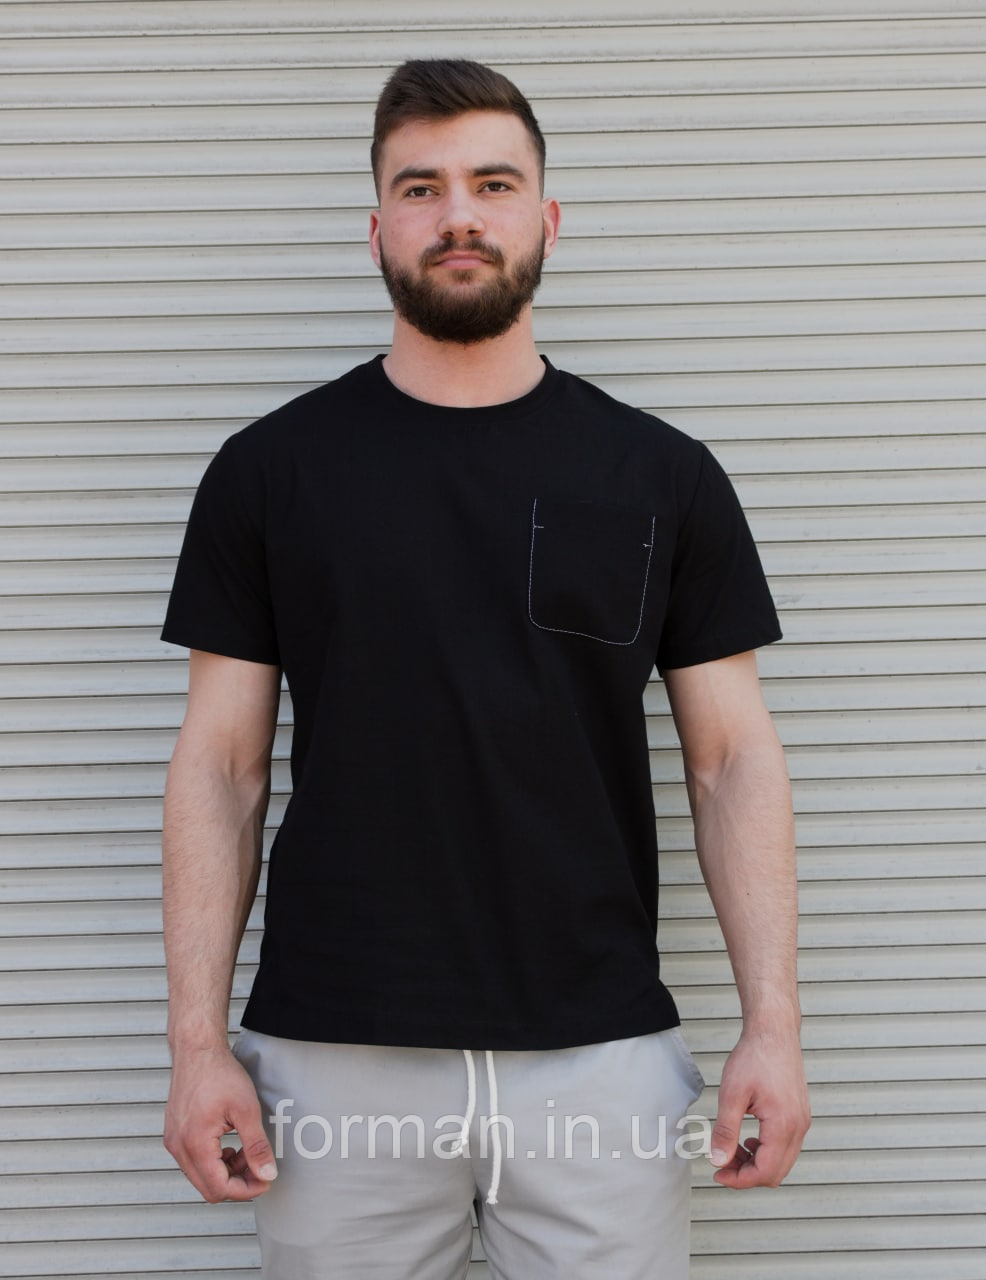 Чорна бавовняний футболка з кишенею на грудях   100% льон